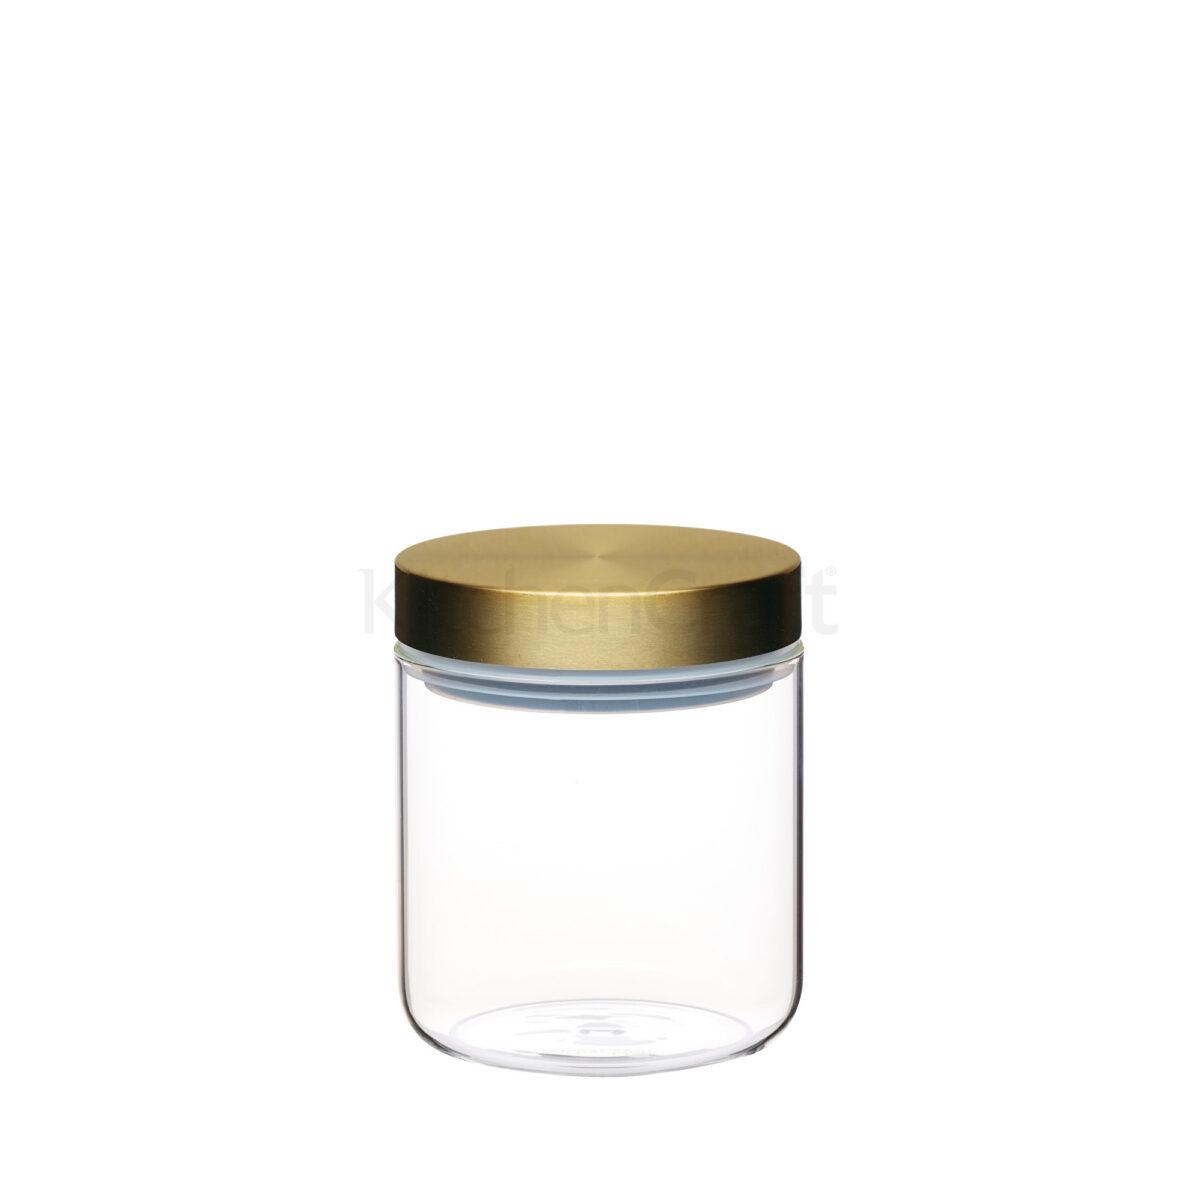 master class airtight small glass food storage jar with brass lid silver mushroom. Black Bedroom Furniture Sets. Home Design Ideas